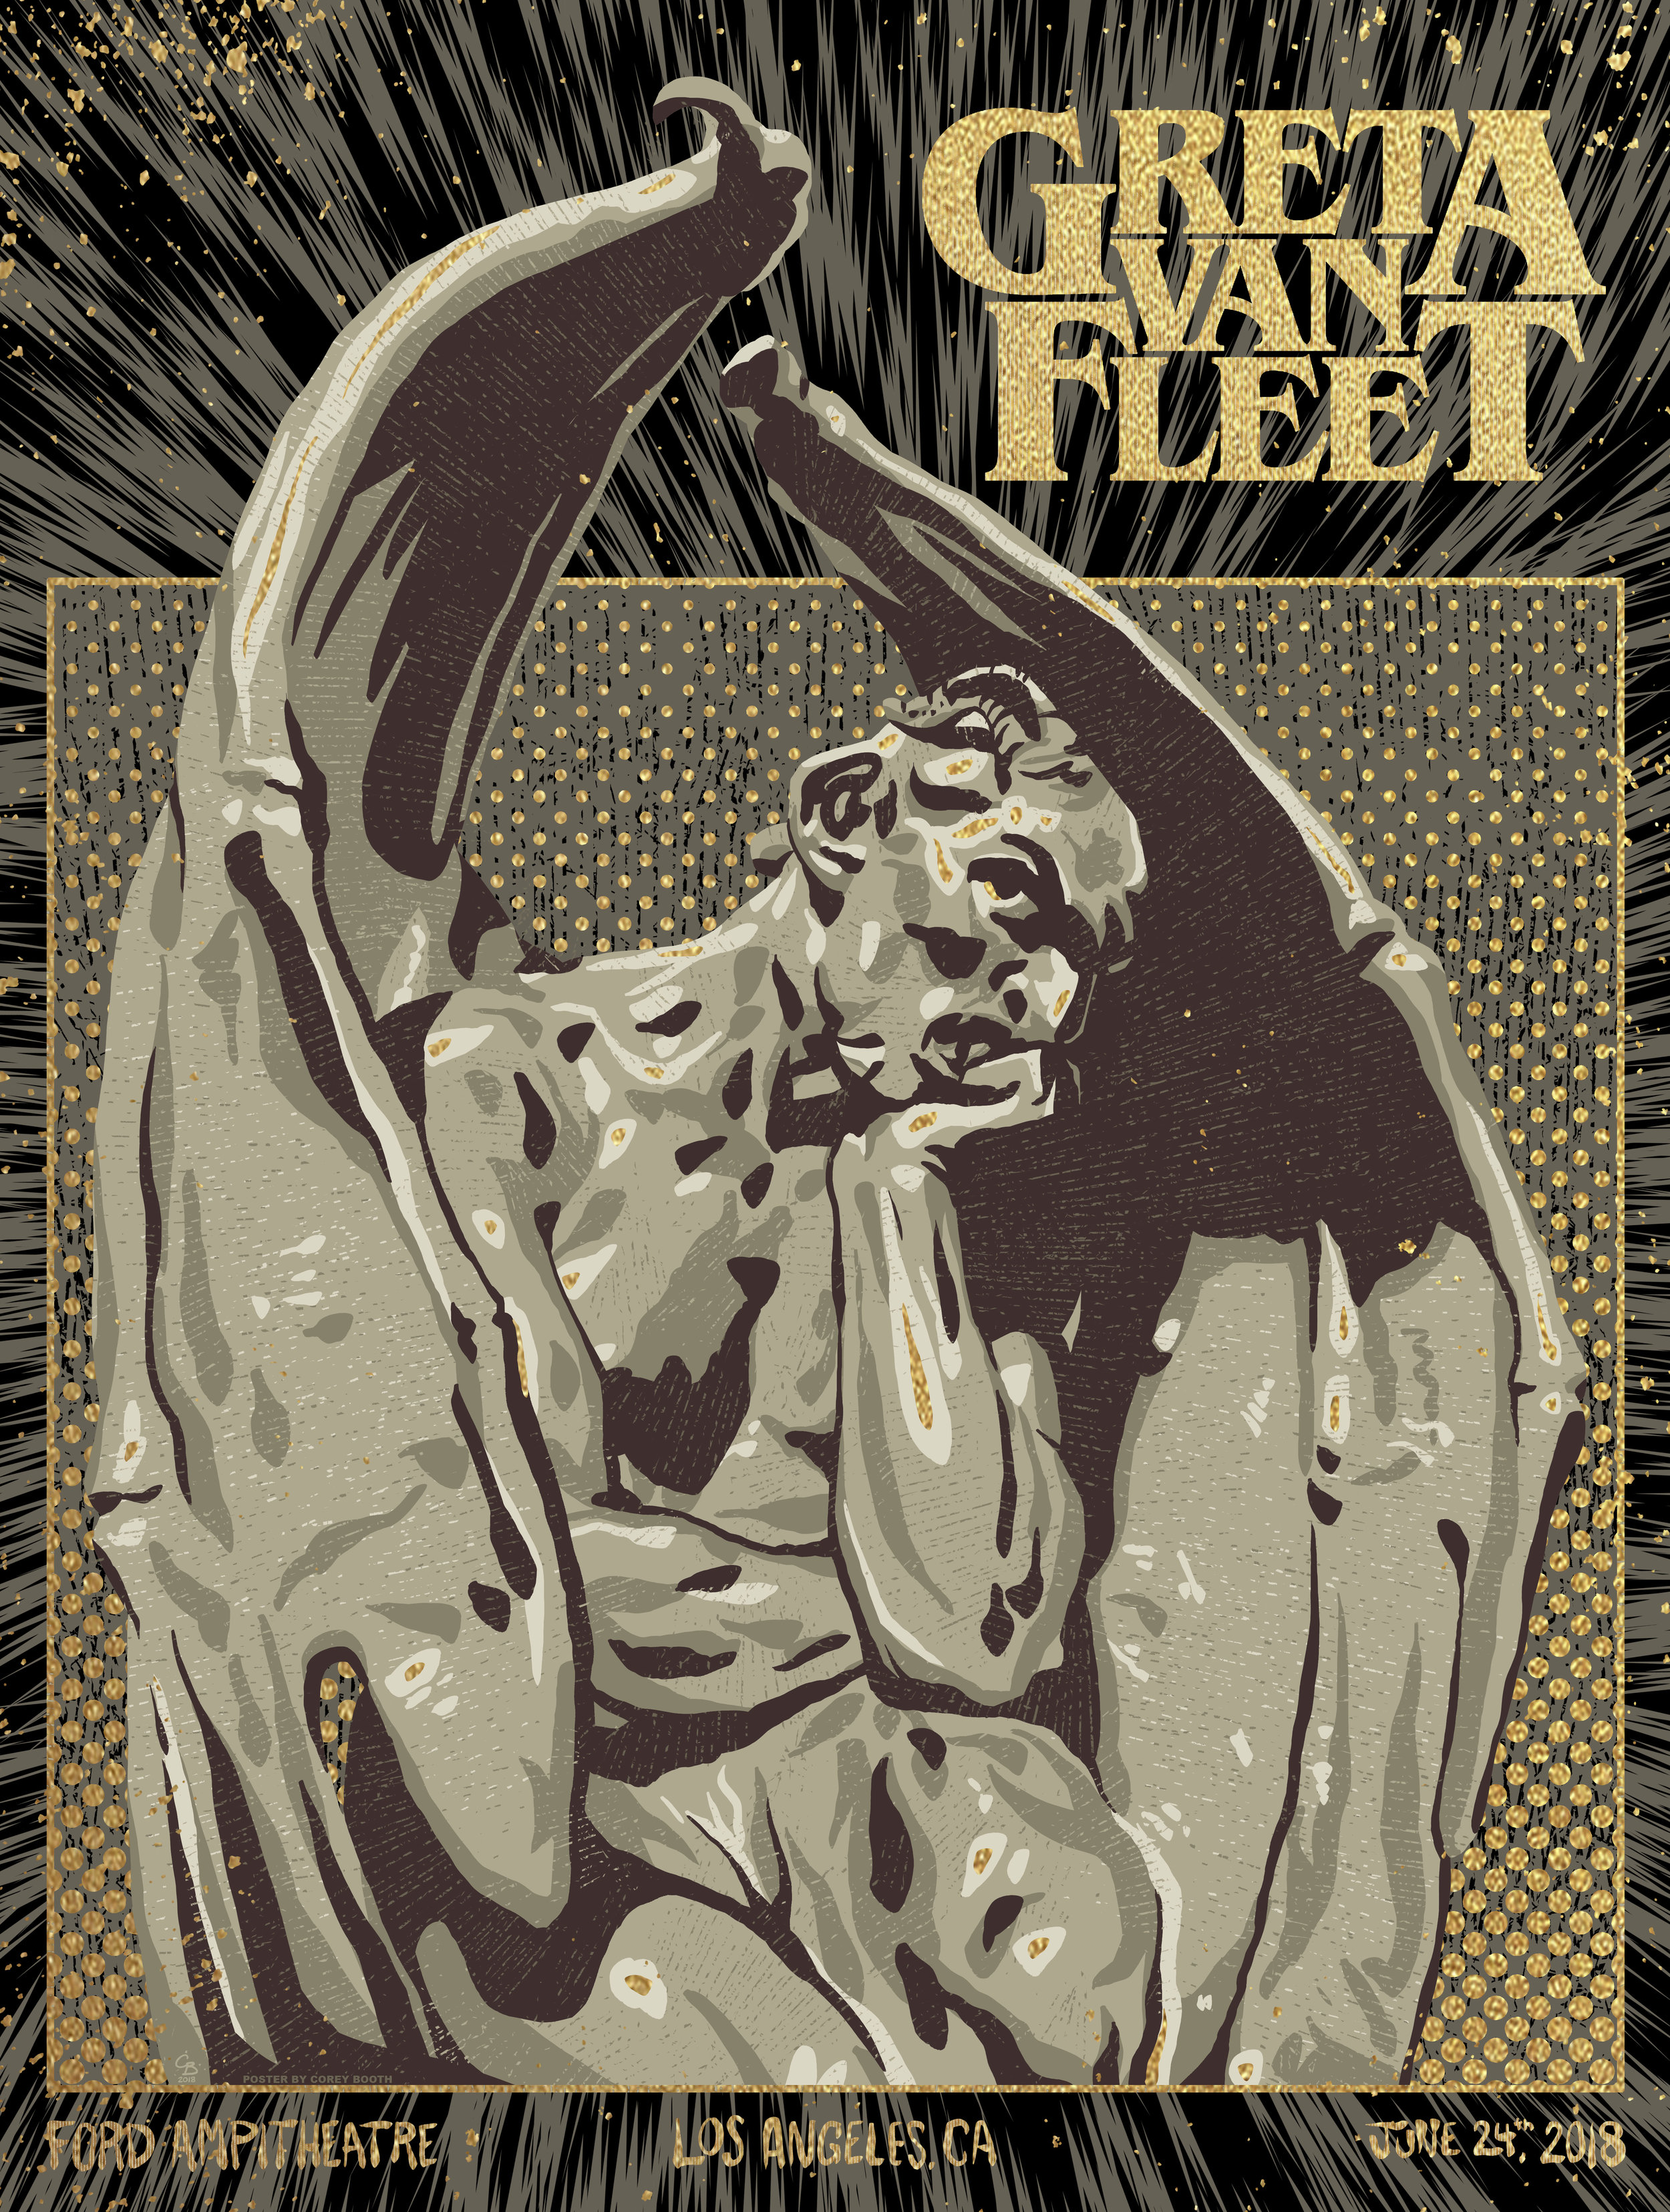 Greta Van Fleet - Stone & Gold Variant